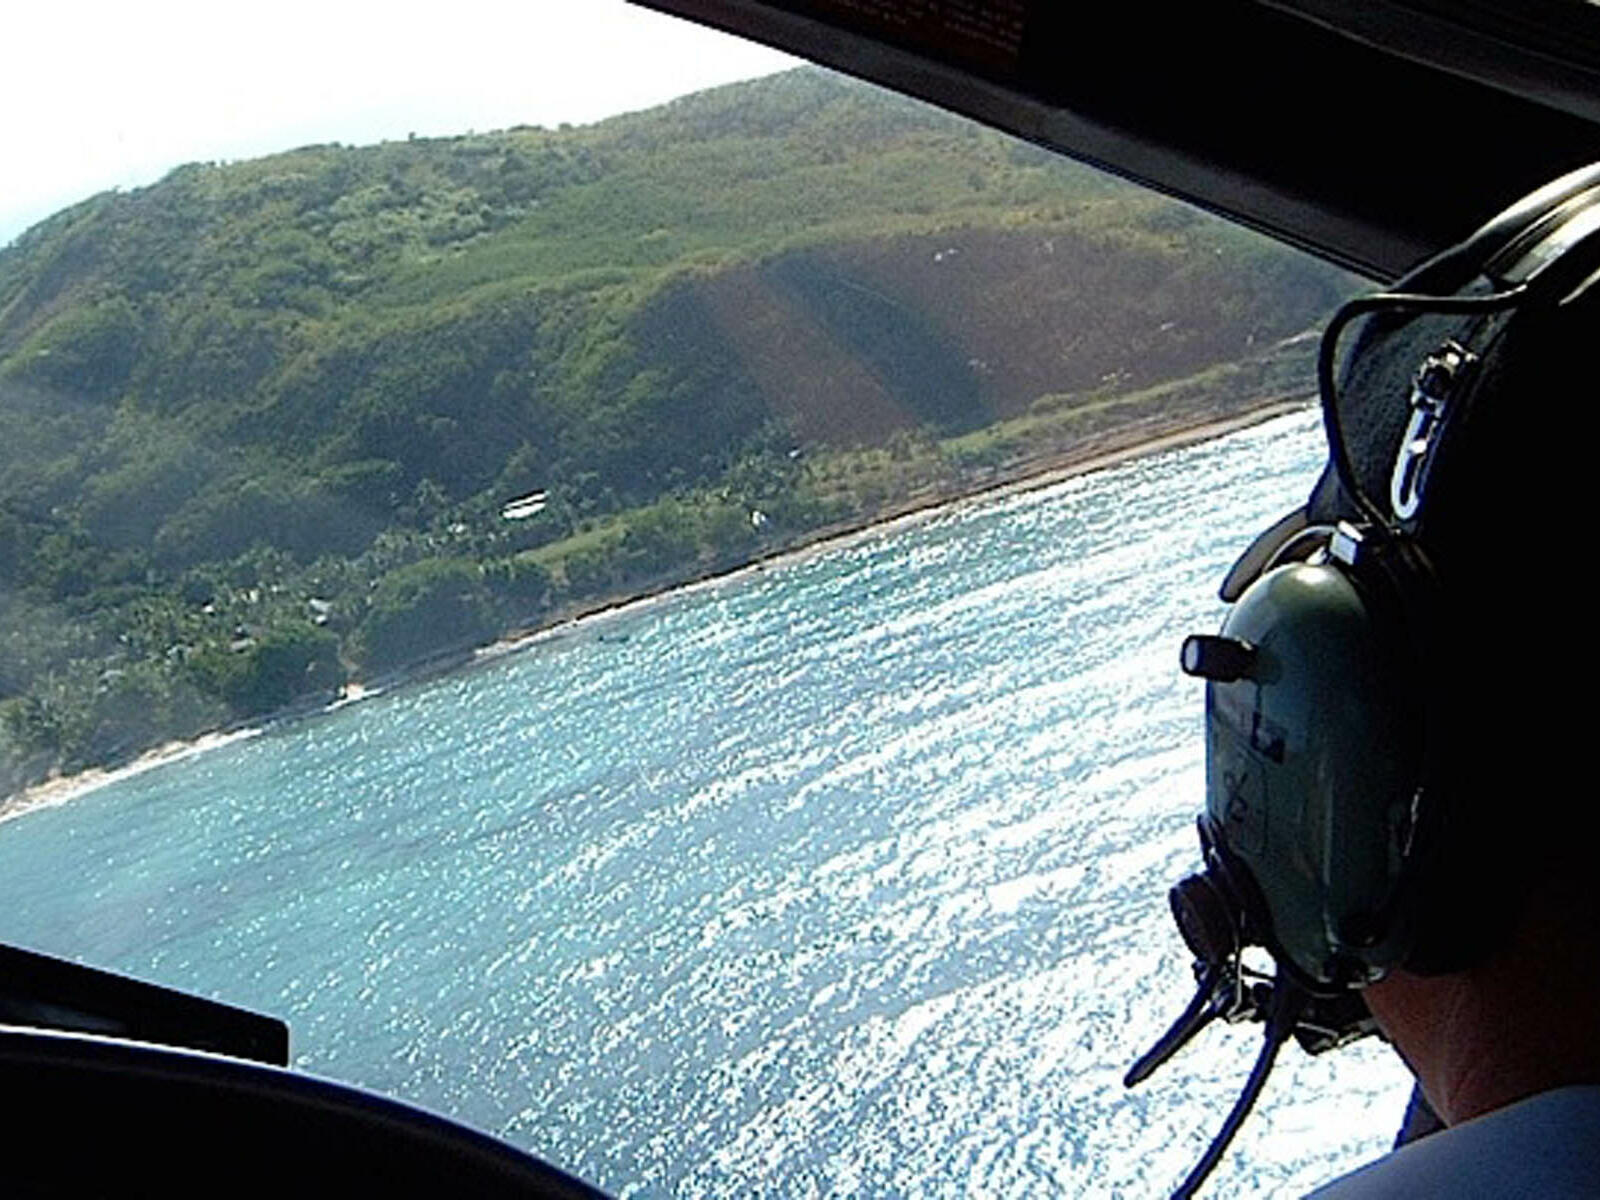 A pilot on a helicopter near Hotel Cascais Miragem